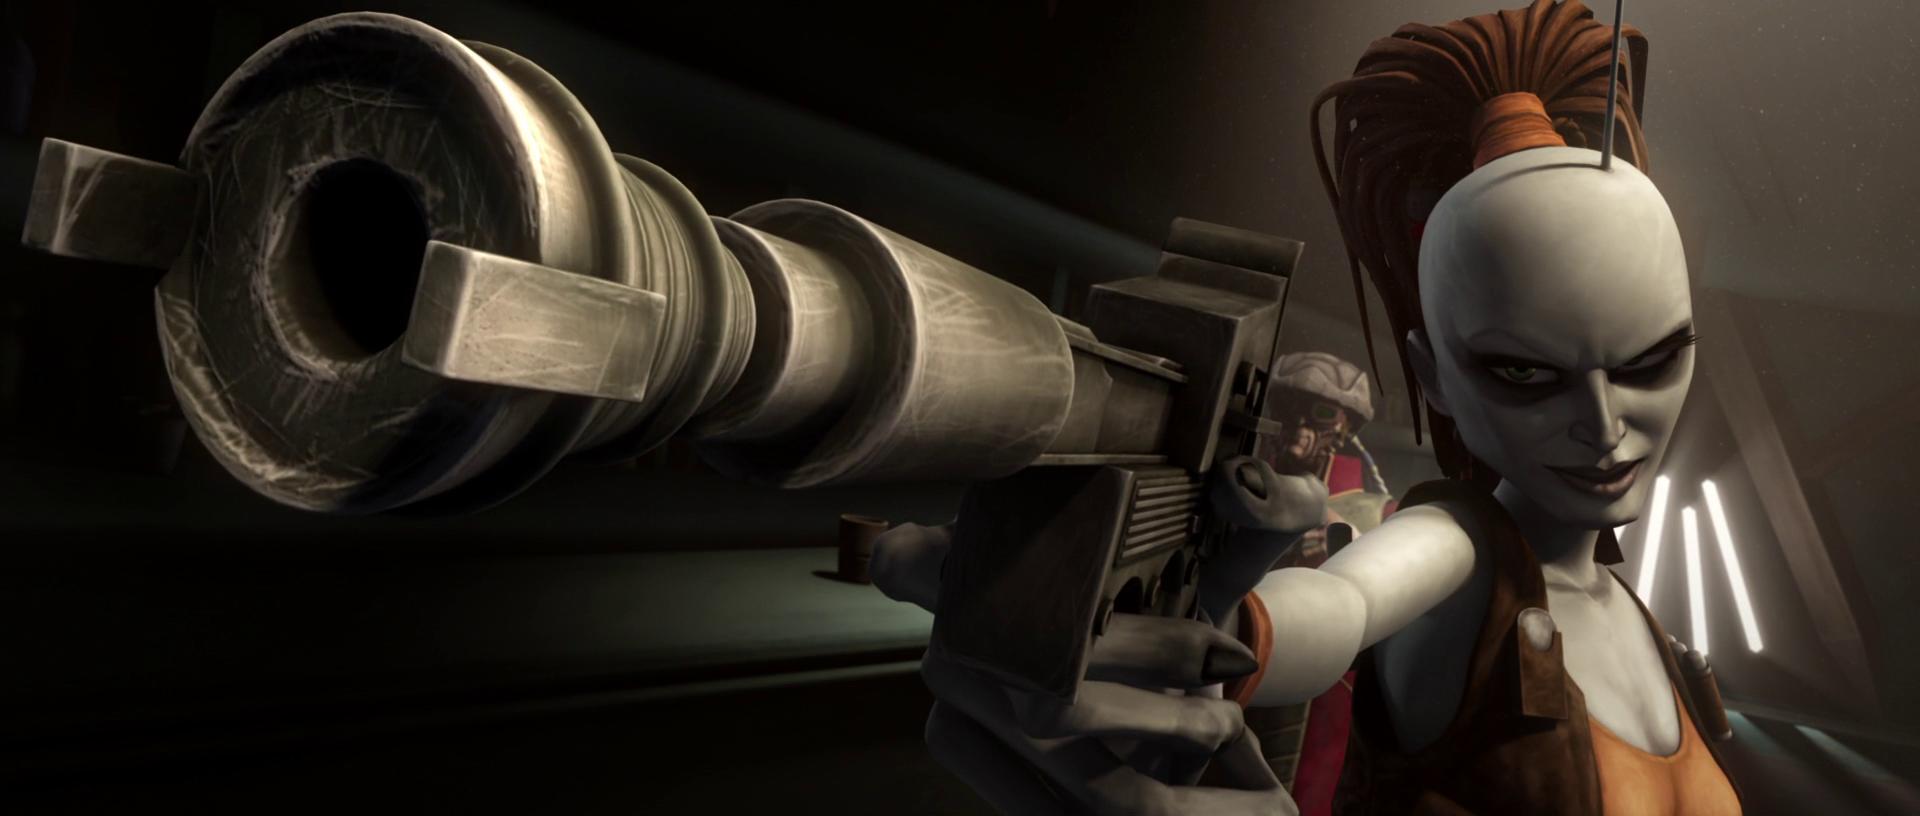 Pistolet blaster DX-13